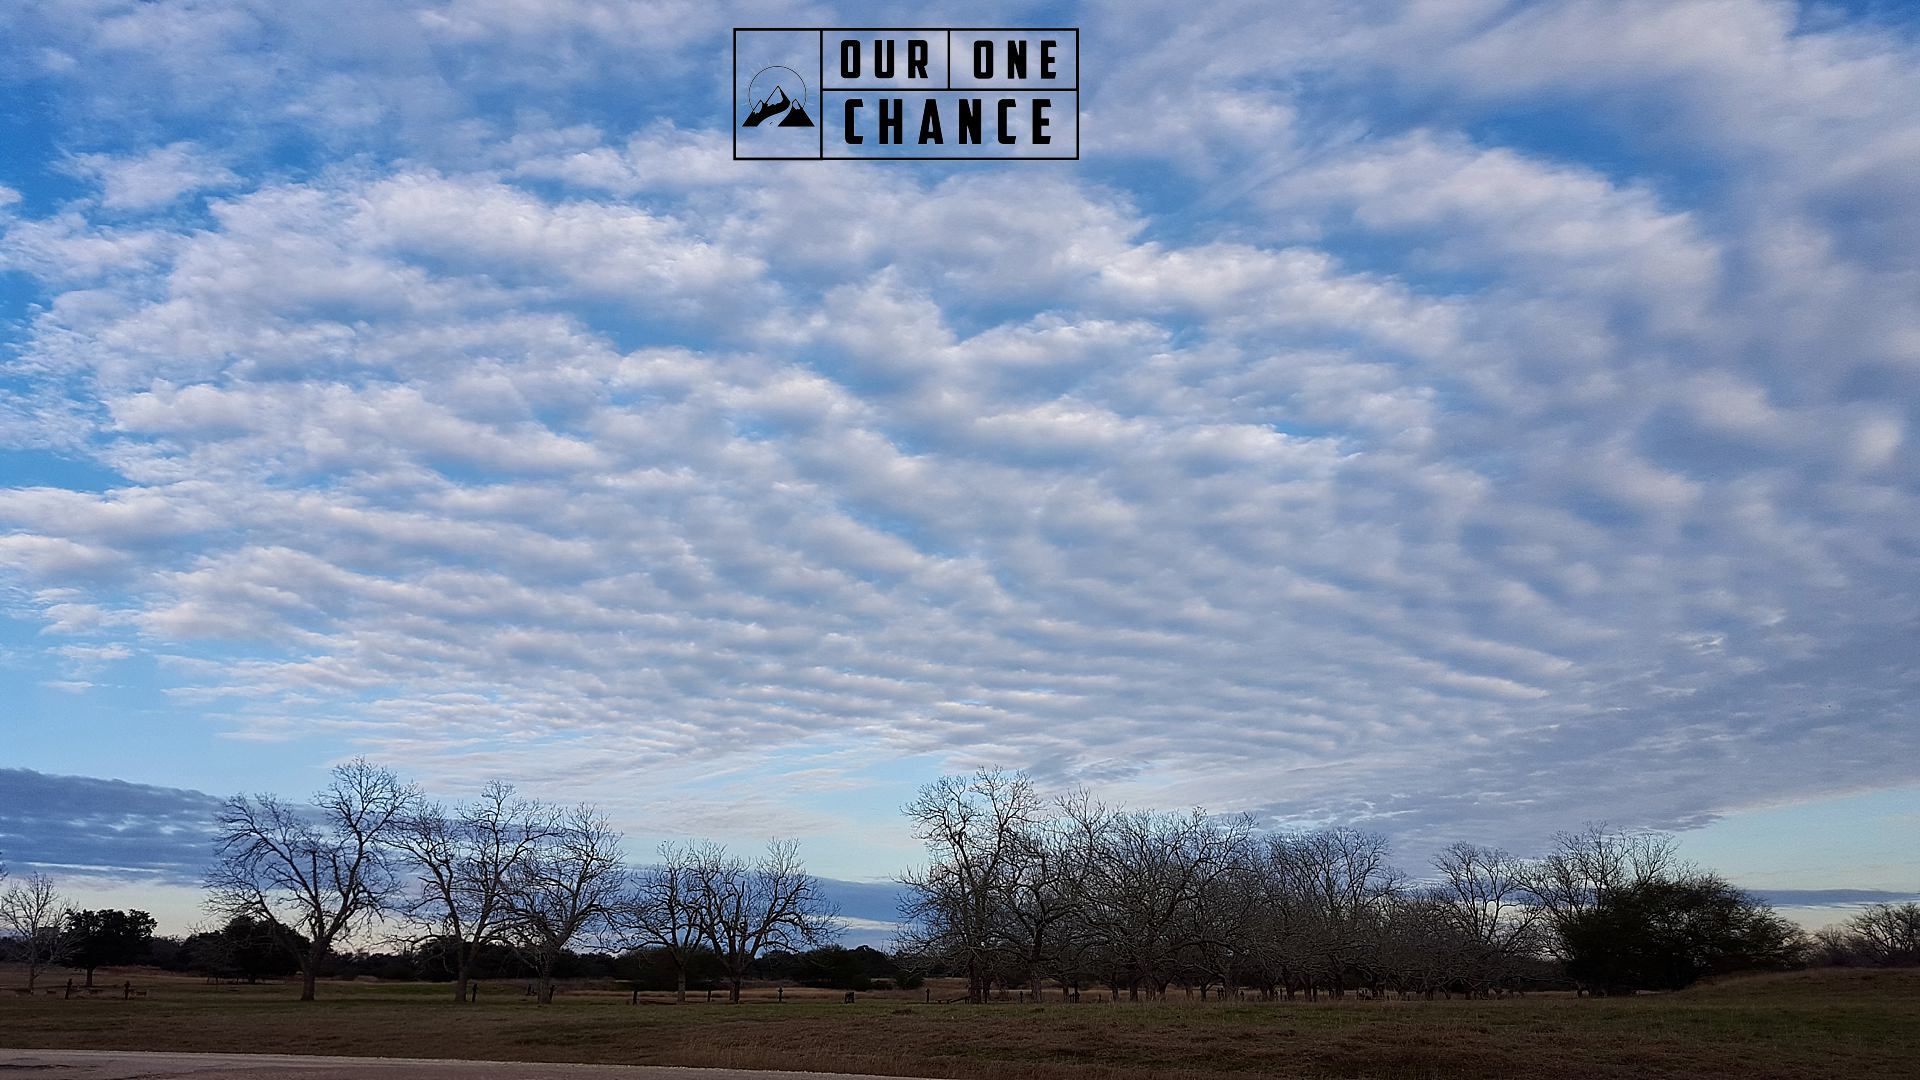 RV Across the Country Texas_0039